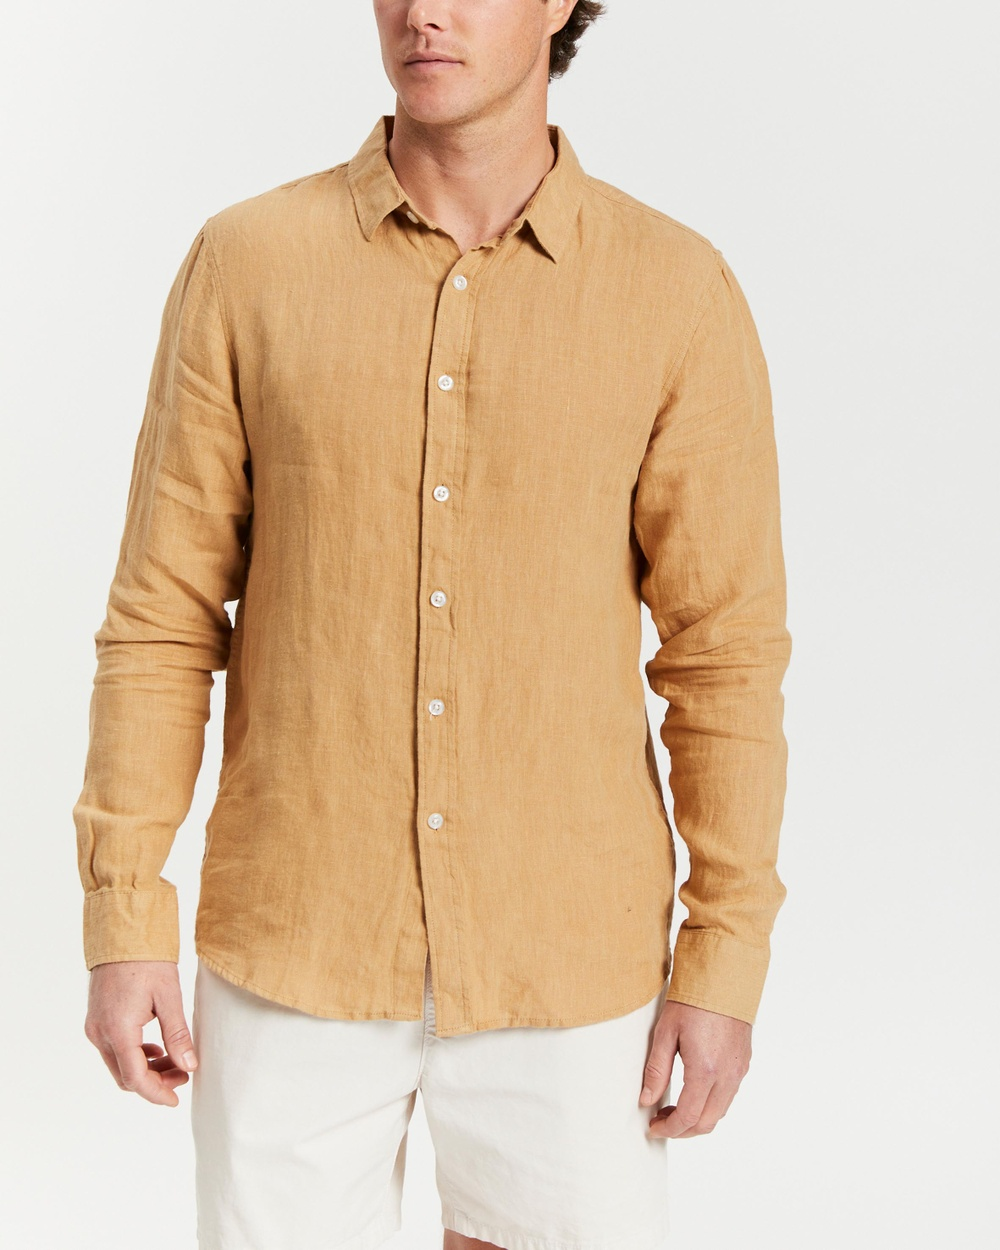 AERE LS Linen Shirt Shirts & Polos Amber